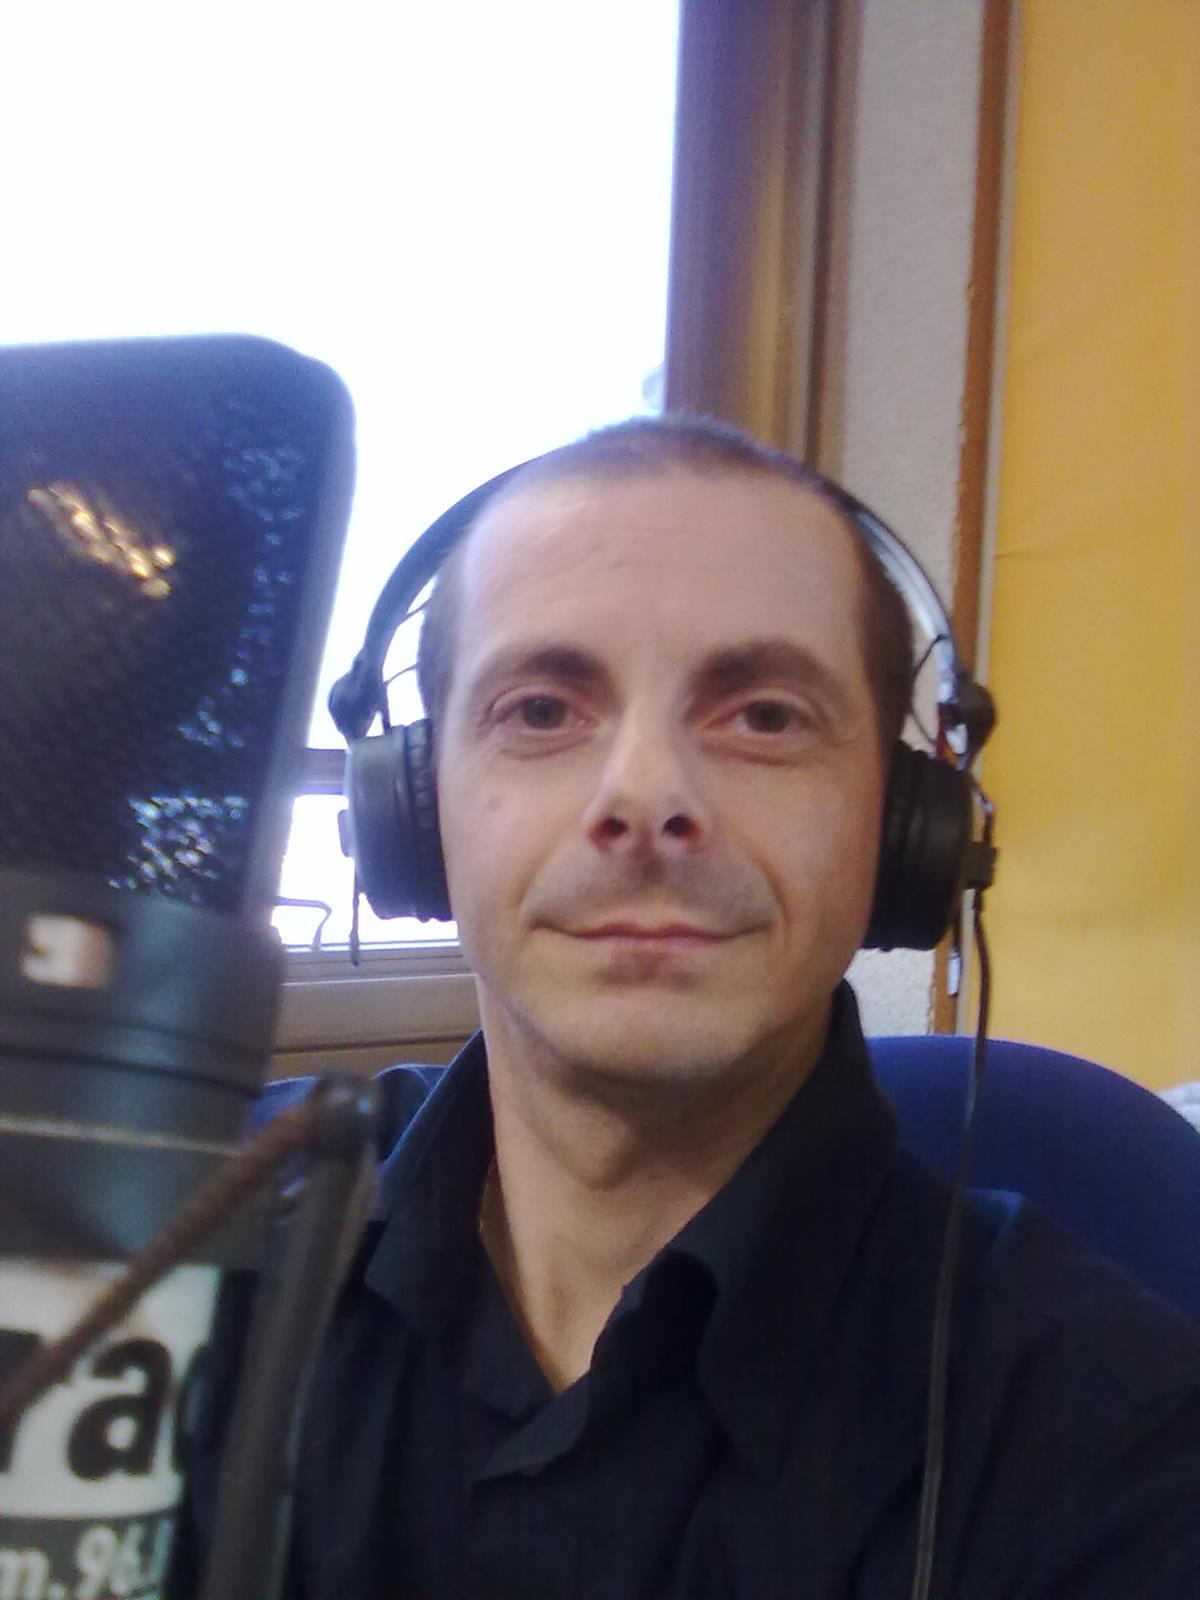 Max Ferrari